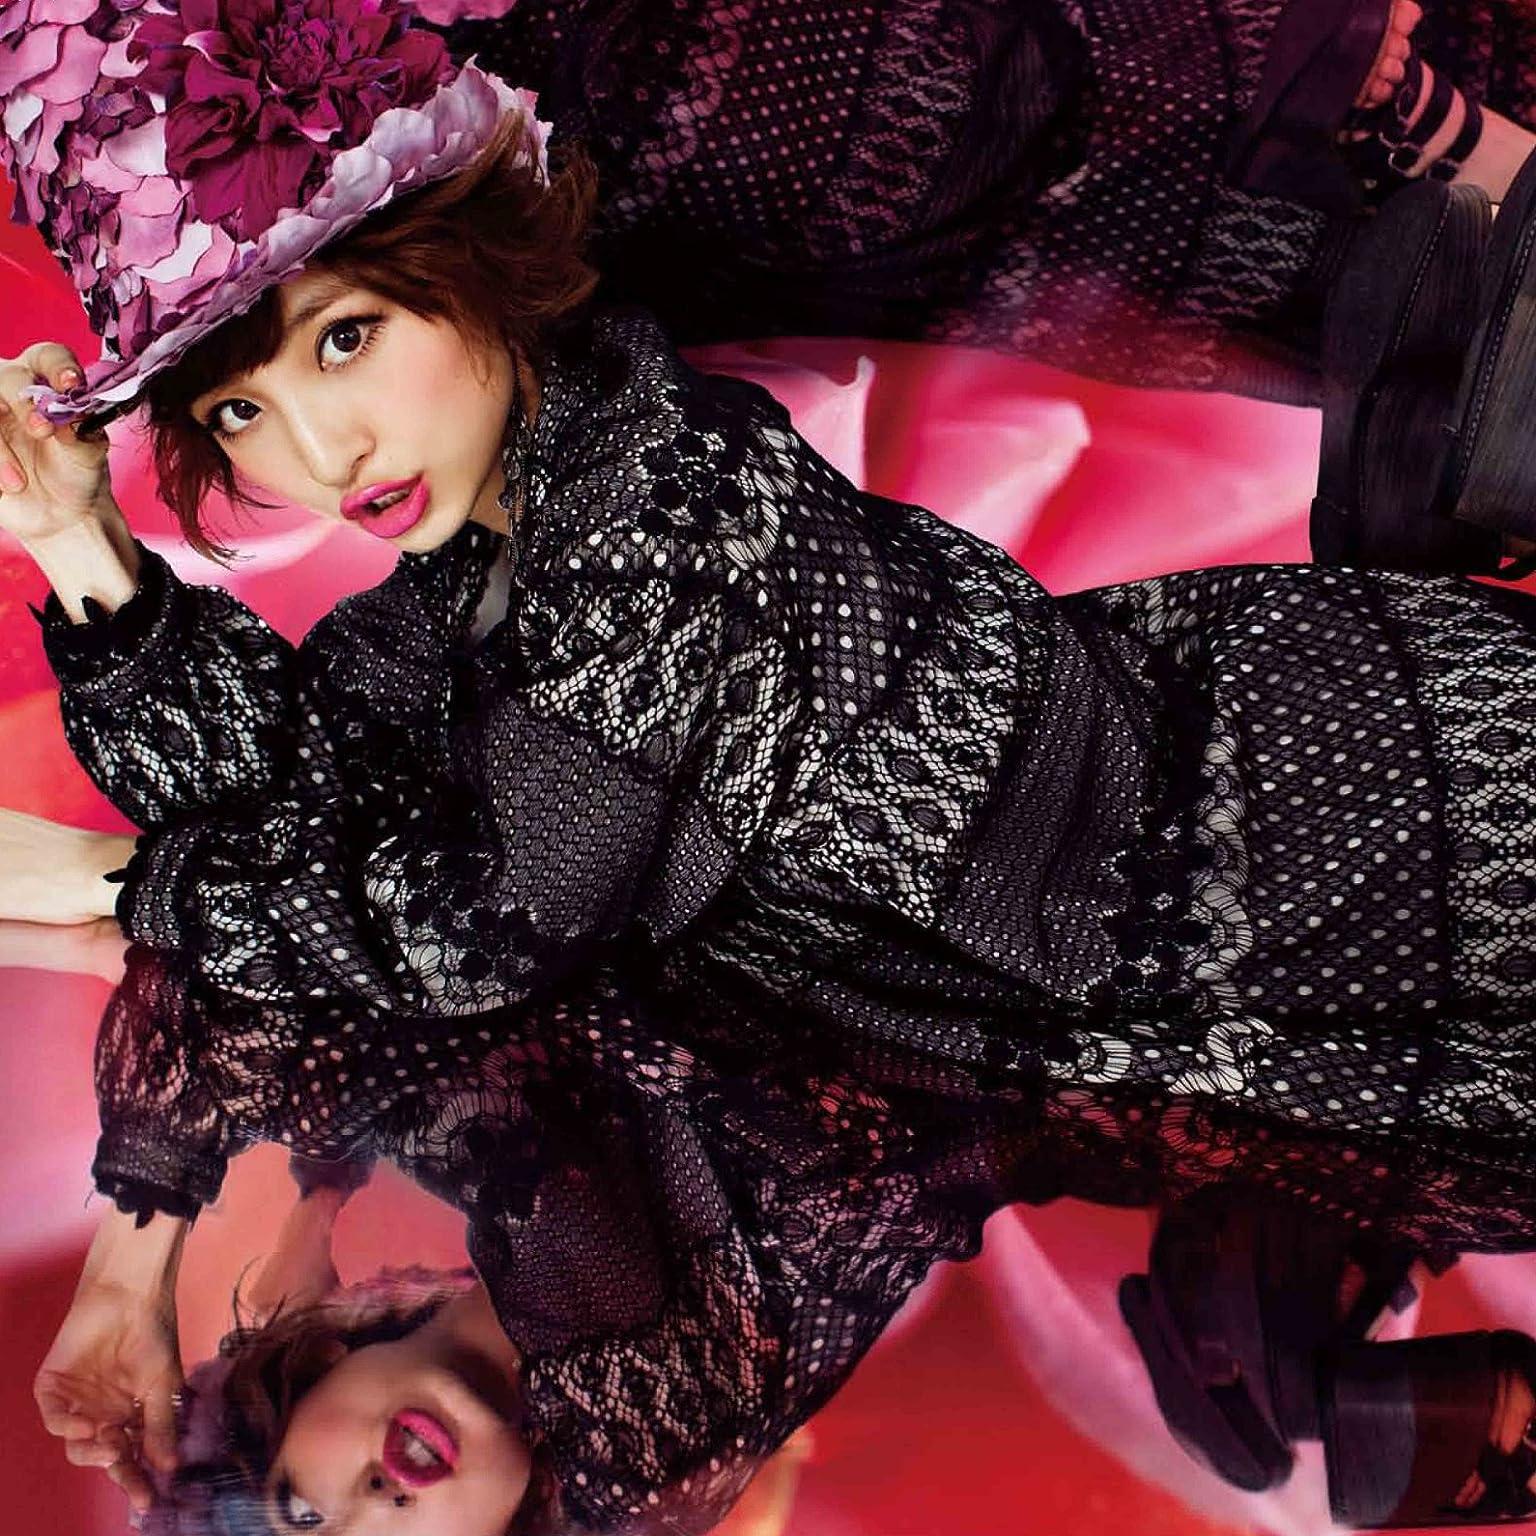 篠田麻里子 M girl 2011-2012AW 蜷川実花×篠田麻里子 iPad壁紙 画像41512 スマポ